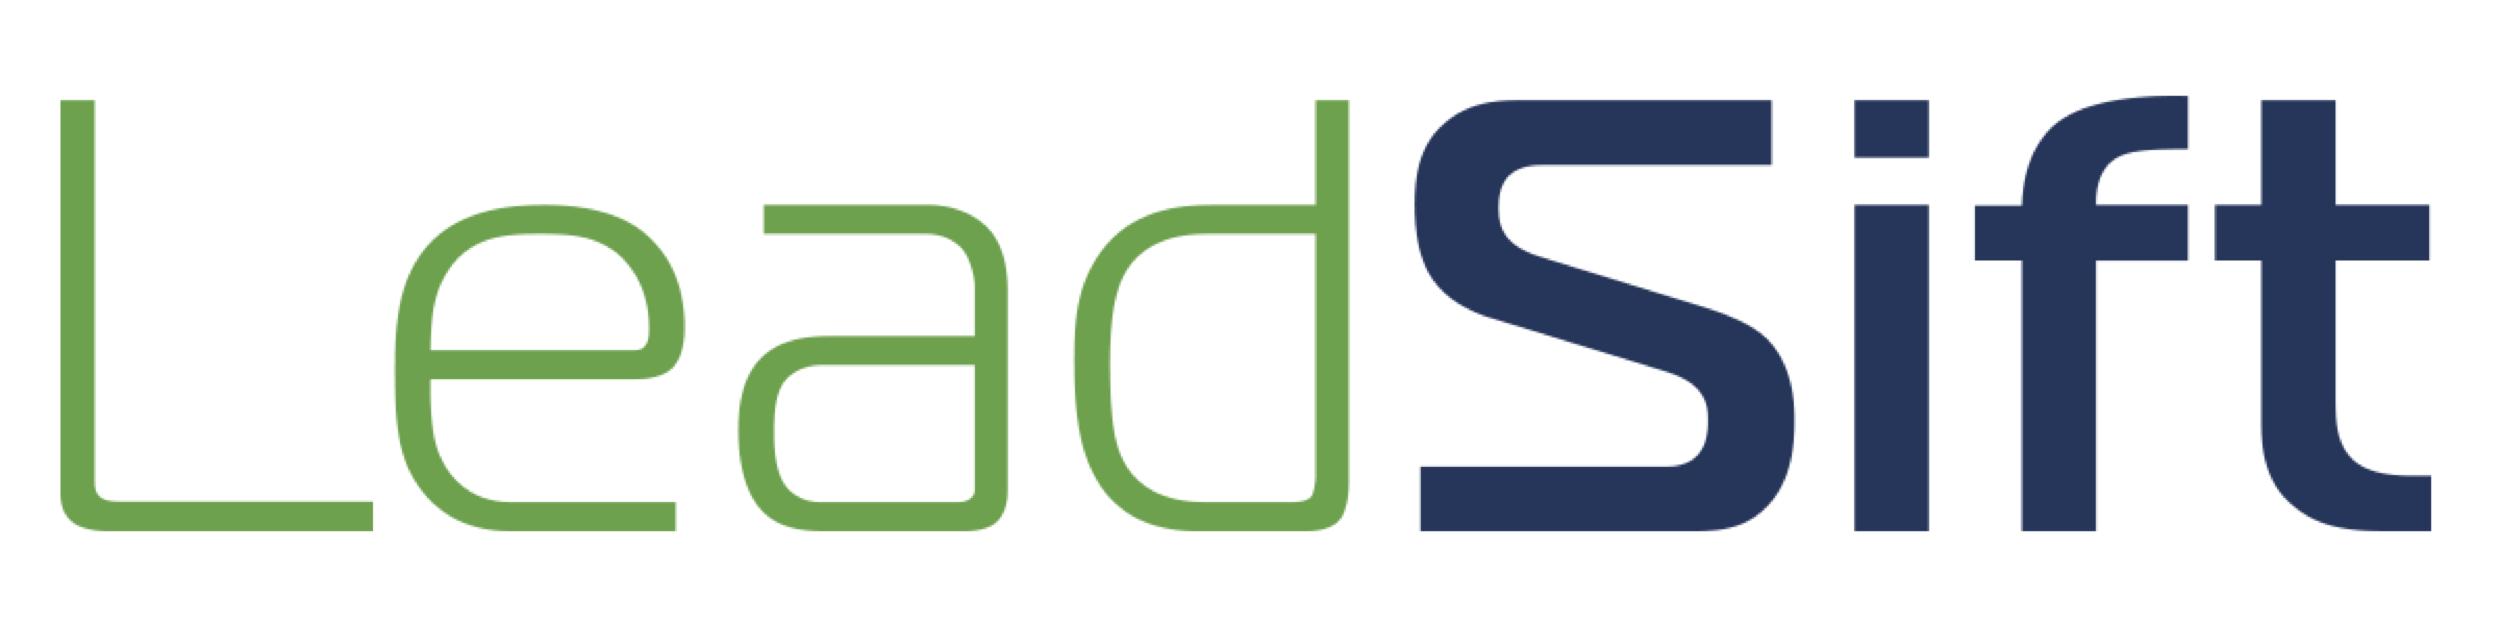 LeadSift-Color-Transparent-Lg